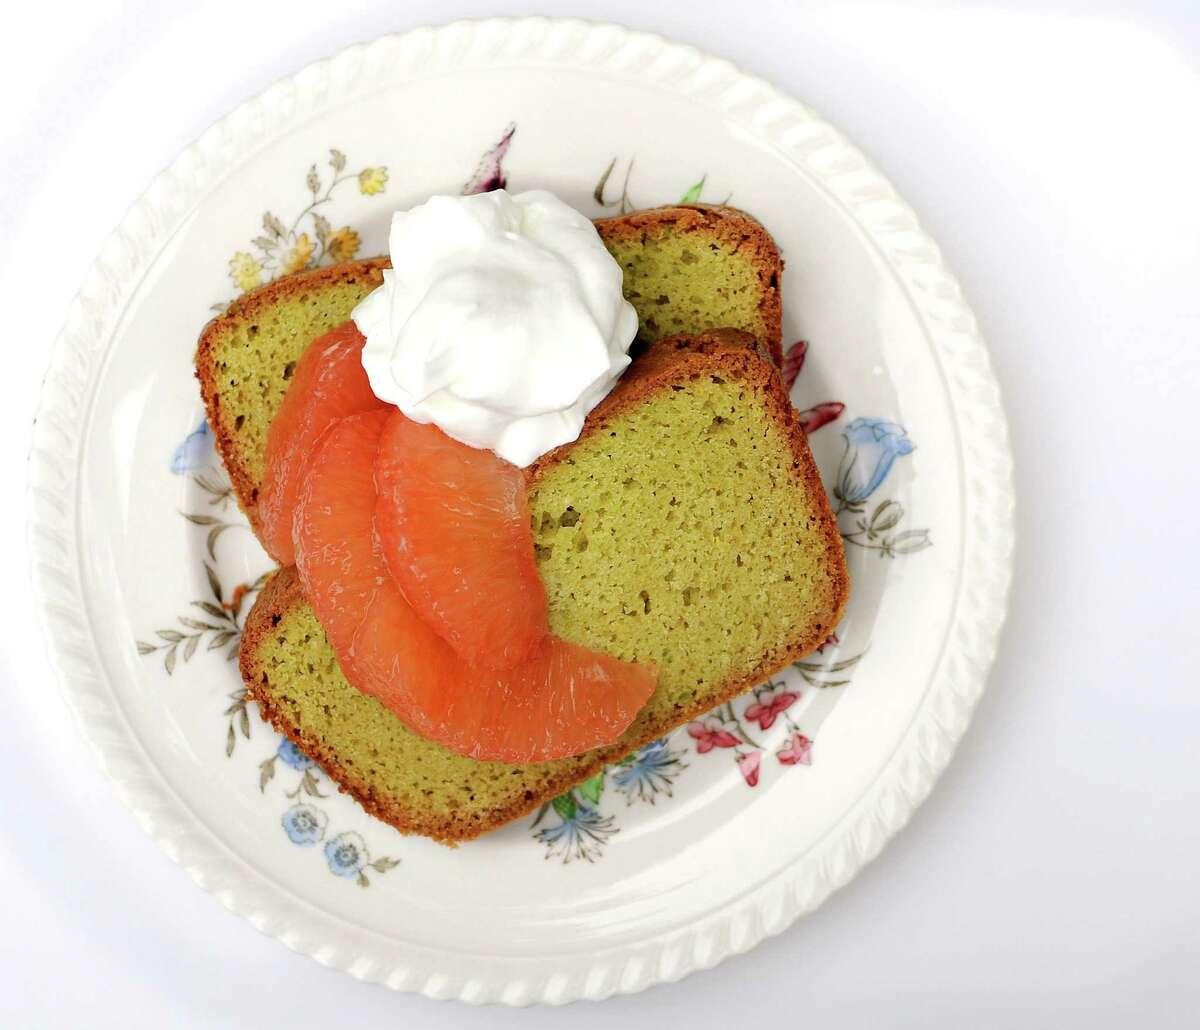 Avocado Pound Cake with grapefruit and whipped cream